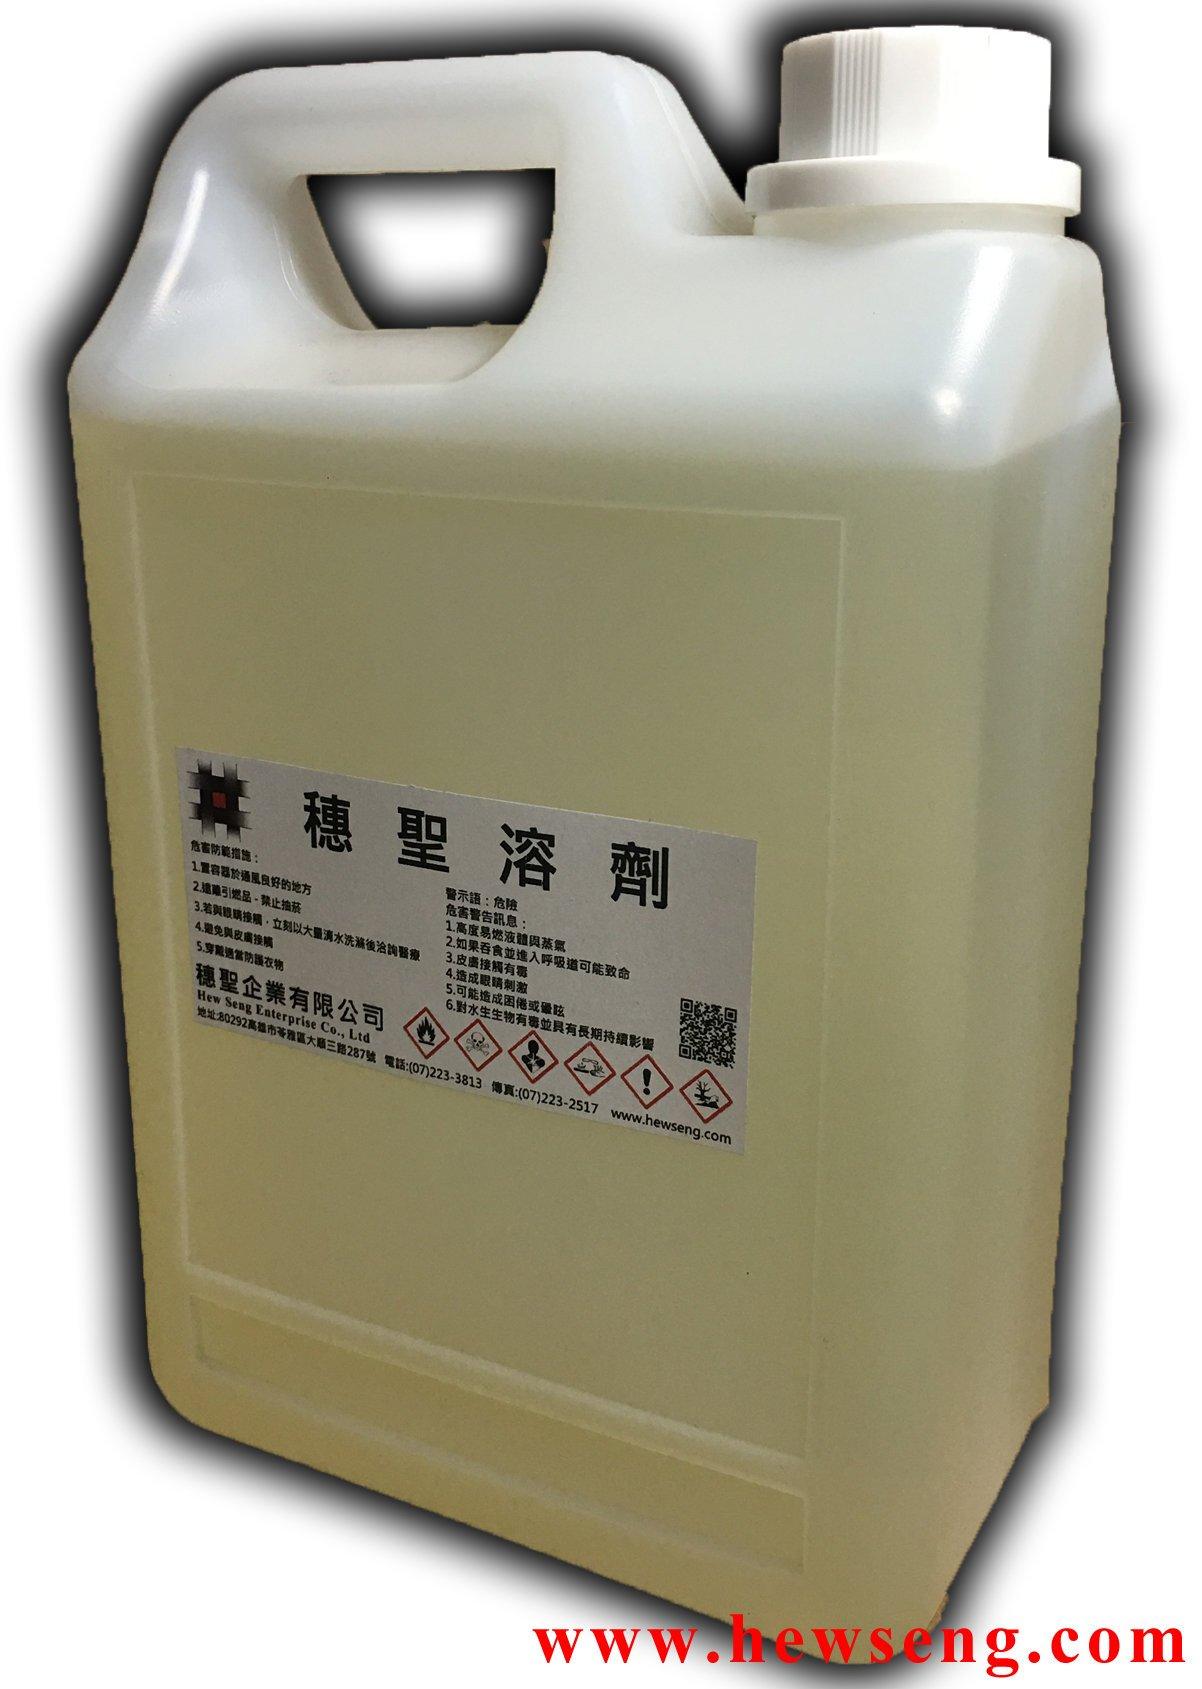 DIY印刷 網版印刷 絲印 油墨溶劑 台灣製造 品質可靠